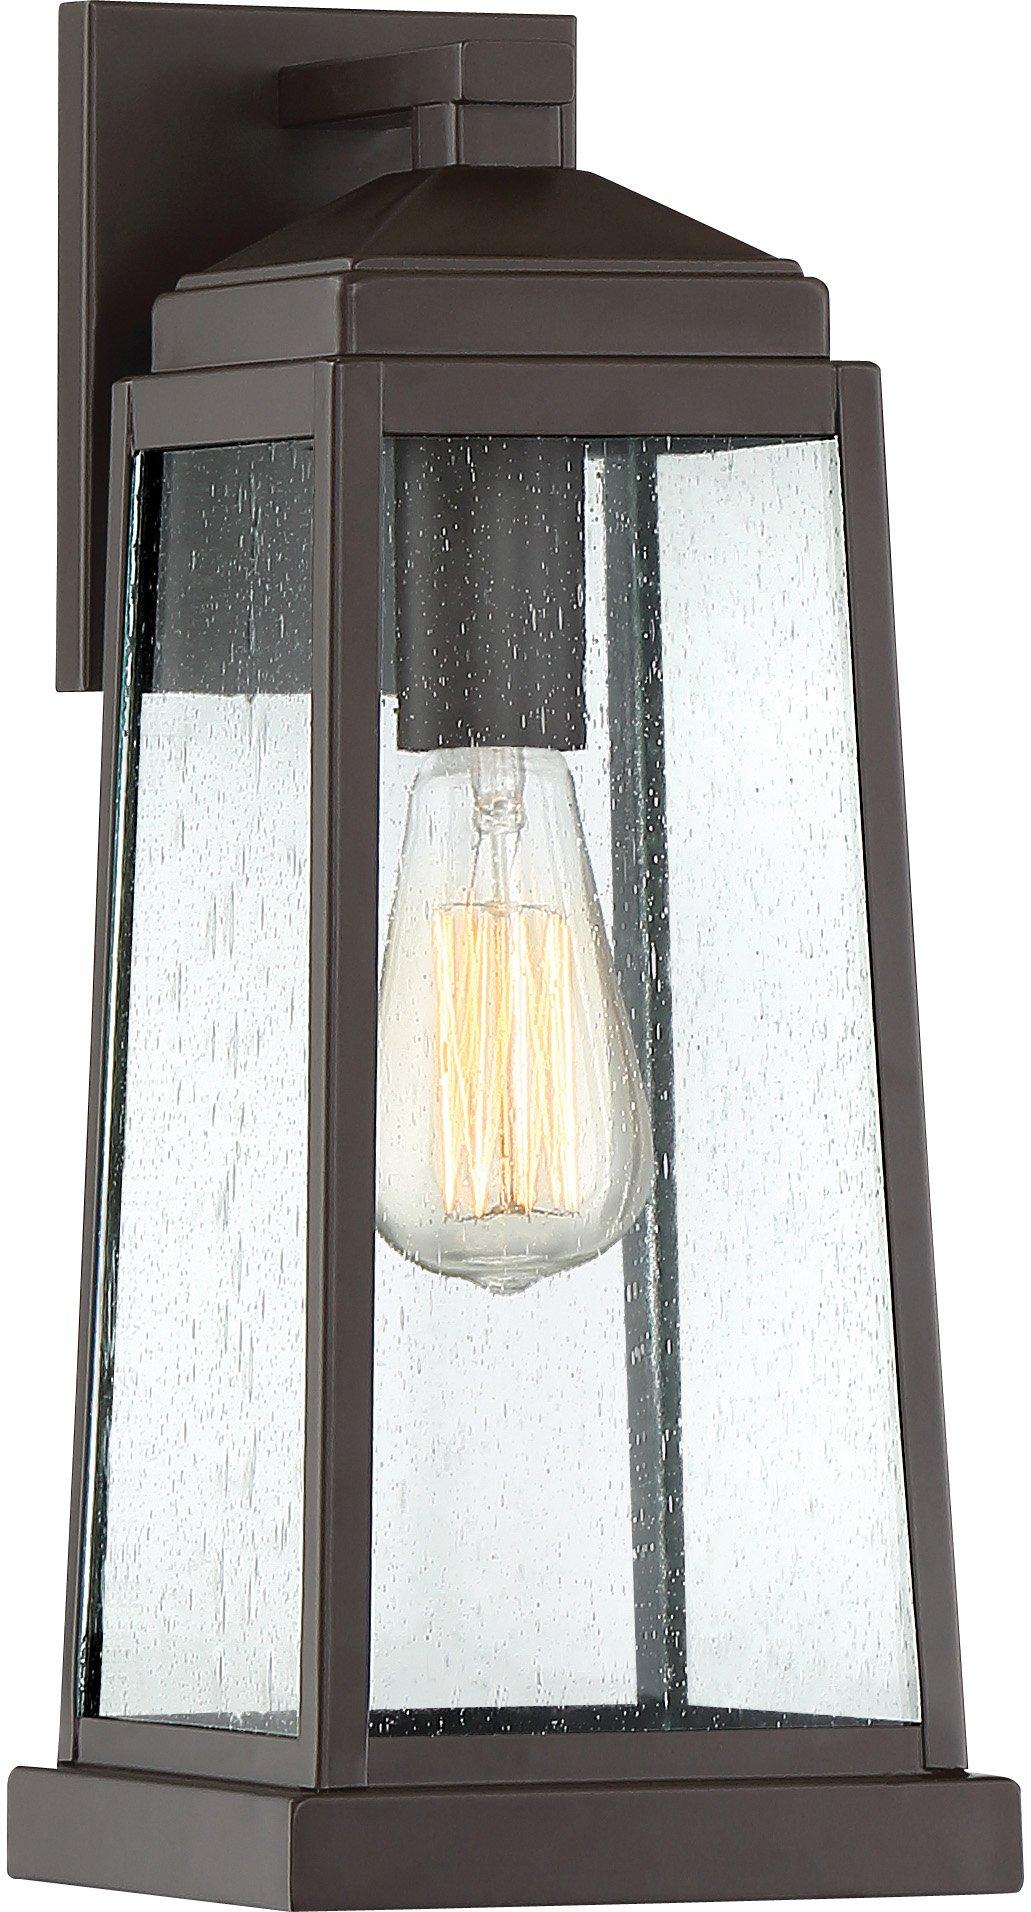 Quoizel RNL8407WT Ravenel Outdoor Wall Sconce Lighting, 1-Light, 100 Watt, Western Bronze (16''H x 7''W)